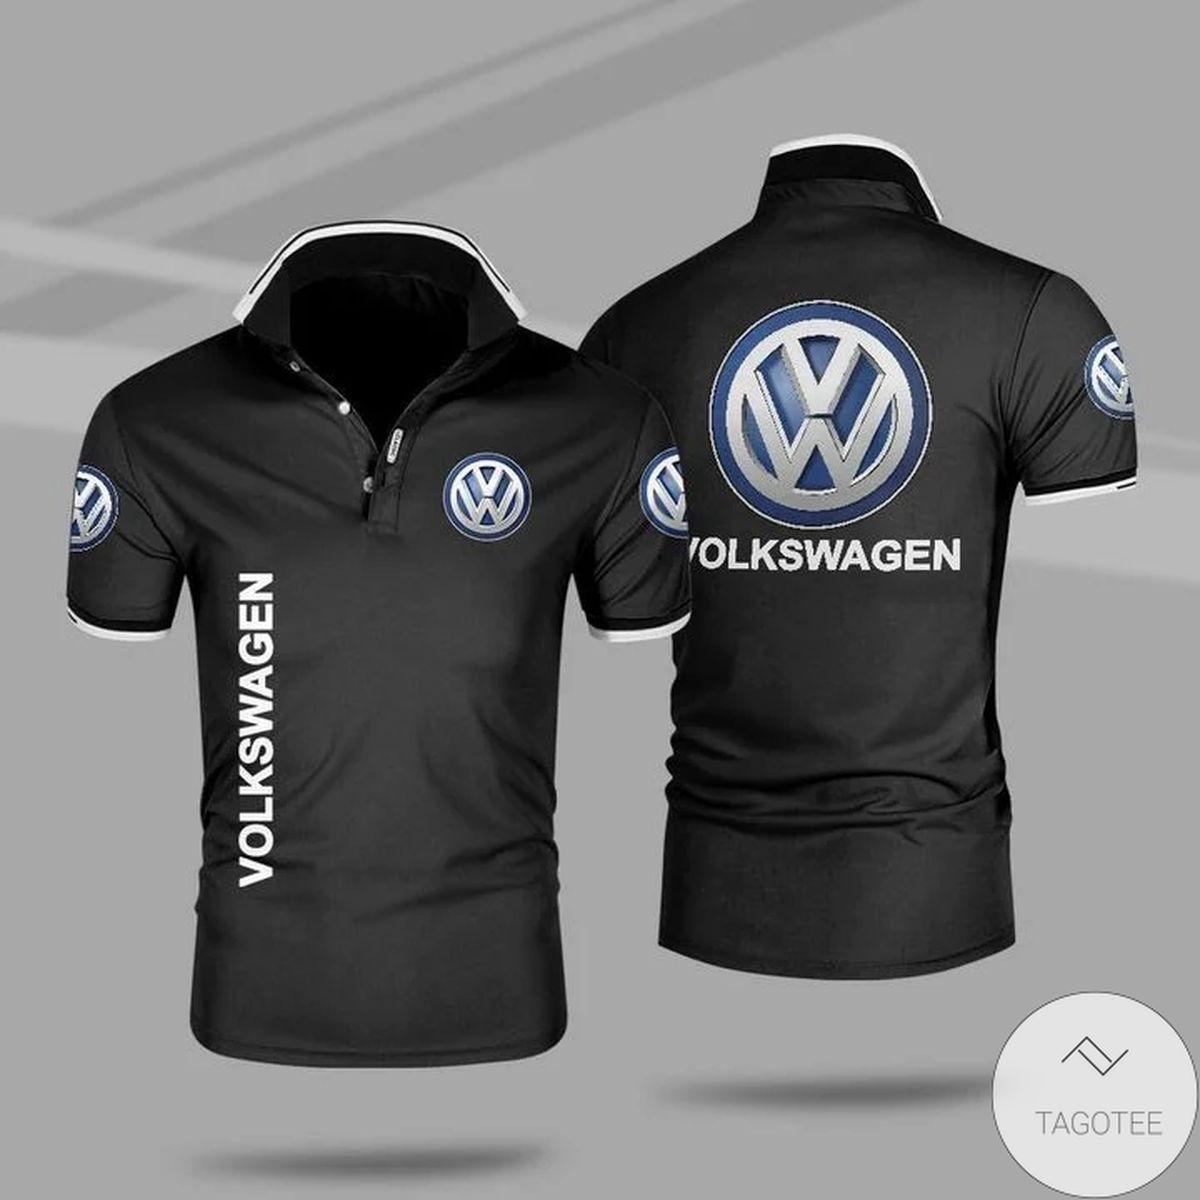 Volkswagen Polo Shirt